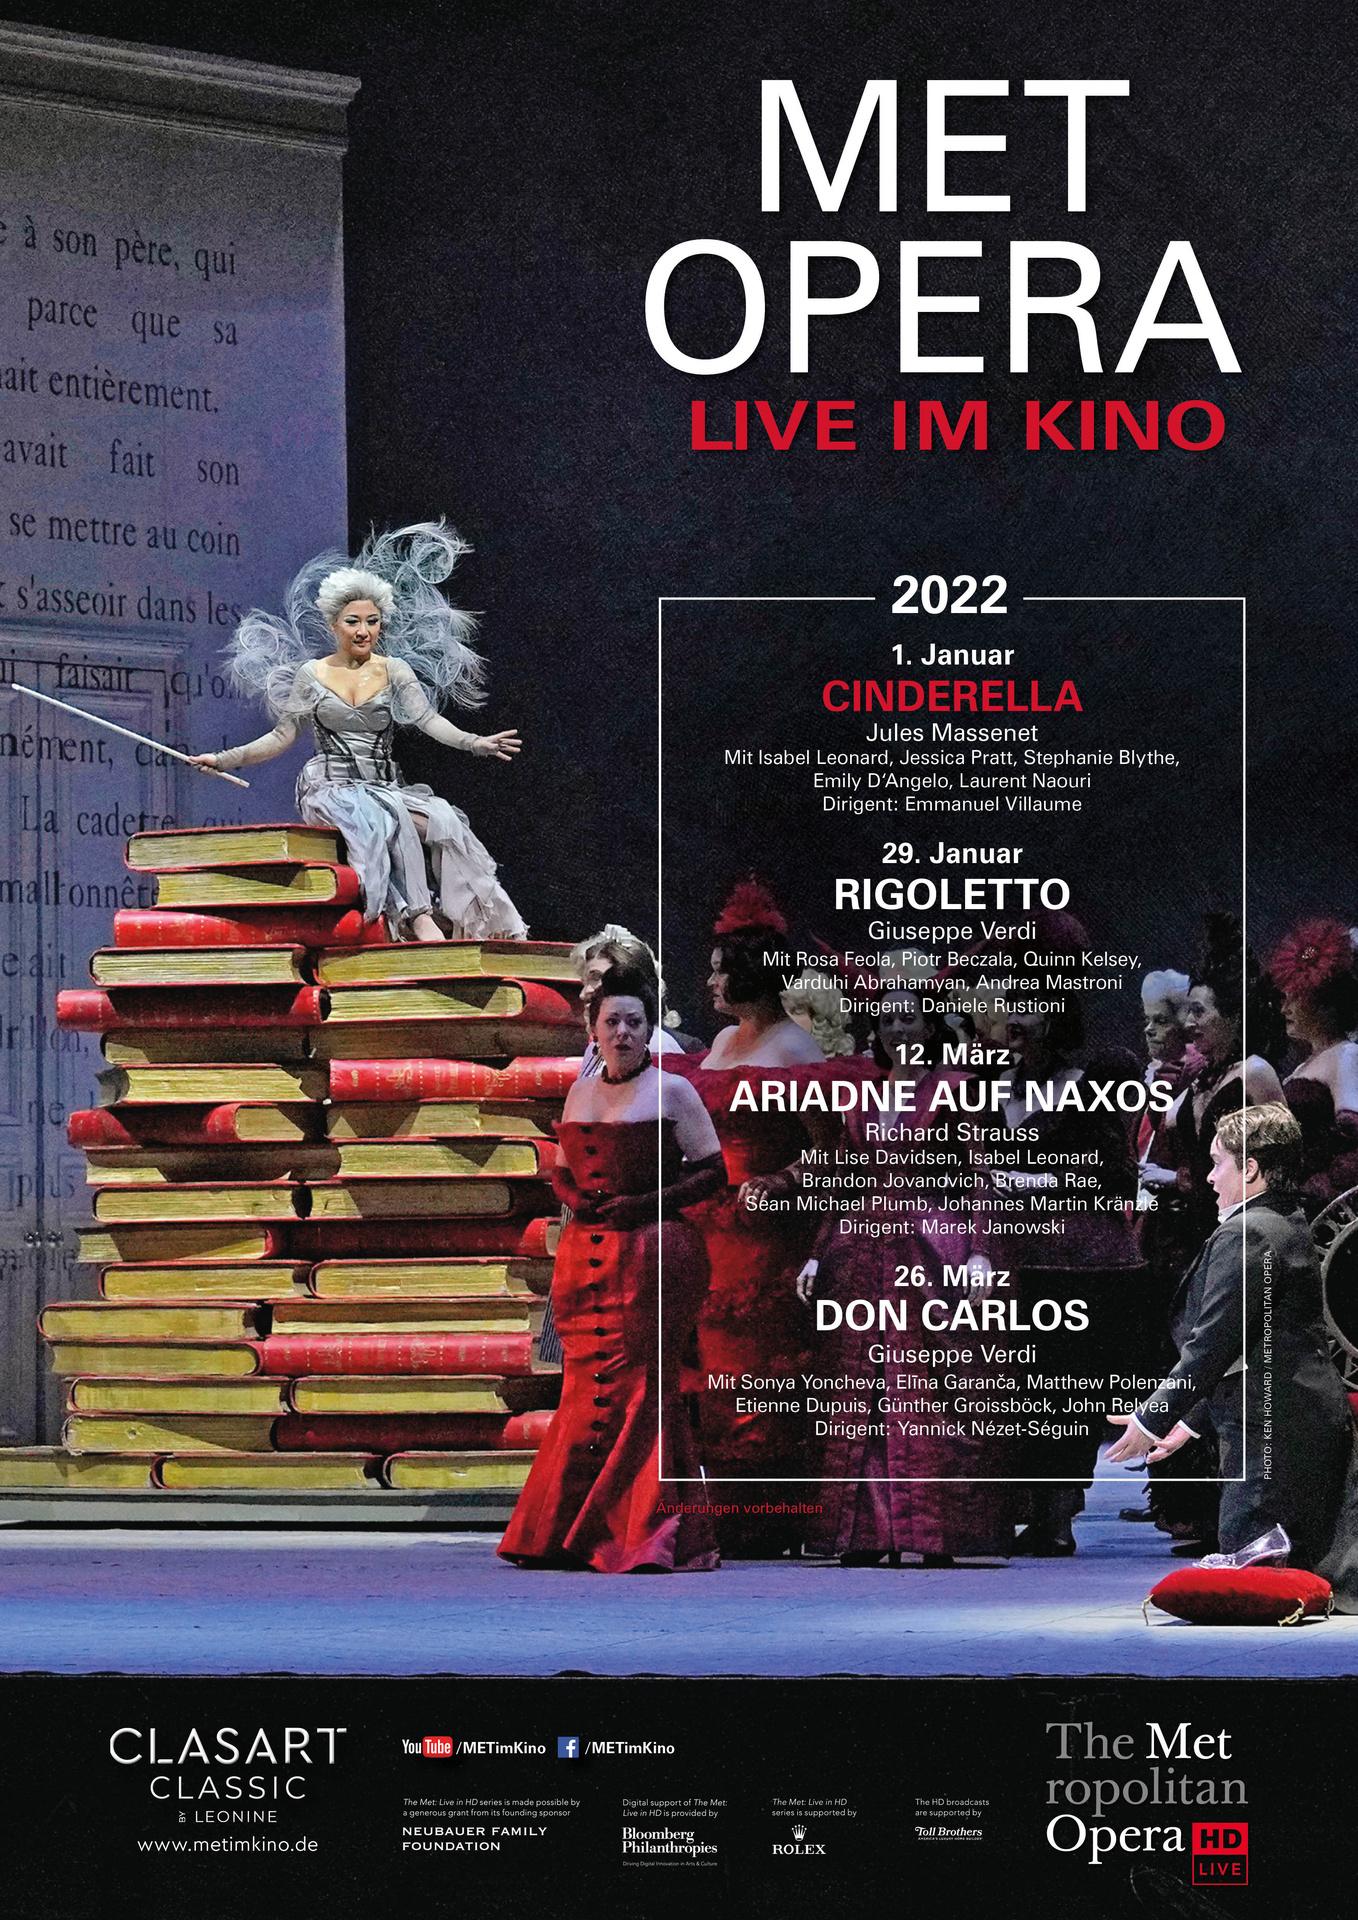 Met Opera 2021/22 Live: Jules Massenet CINDERELLA